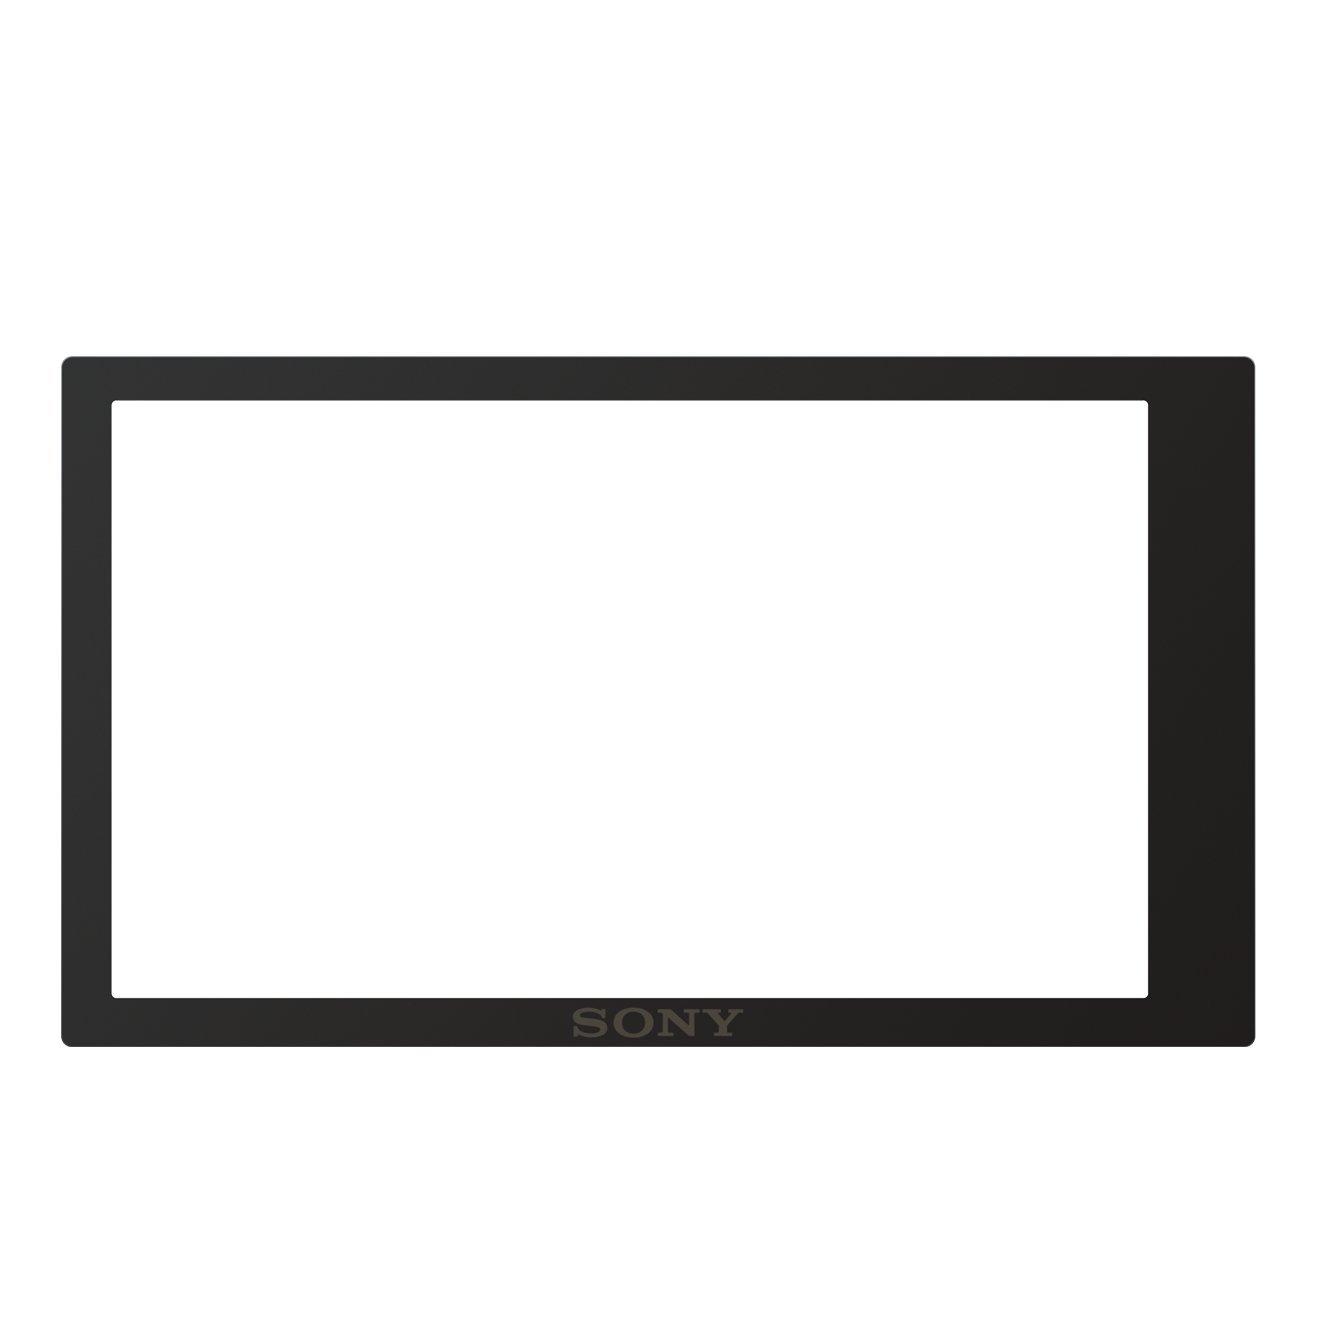 Sony PCKLM17 - Protector de pantalla para cámara digital Sony A6000 product image